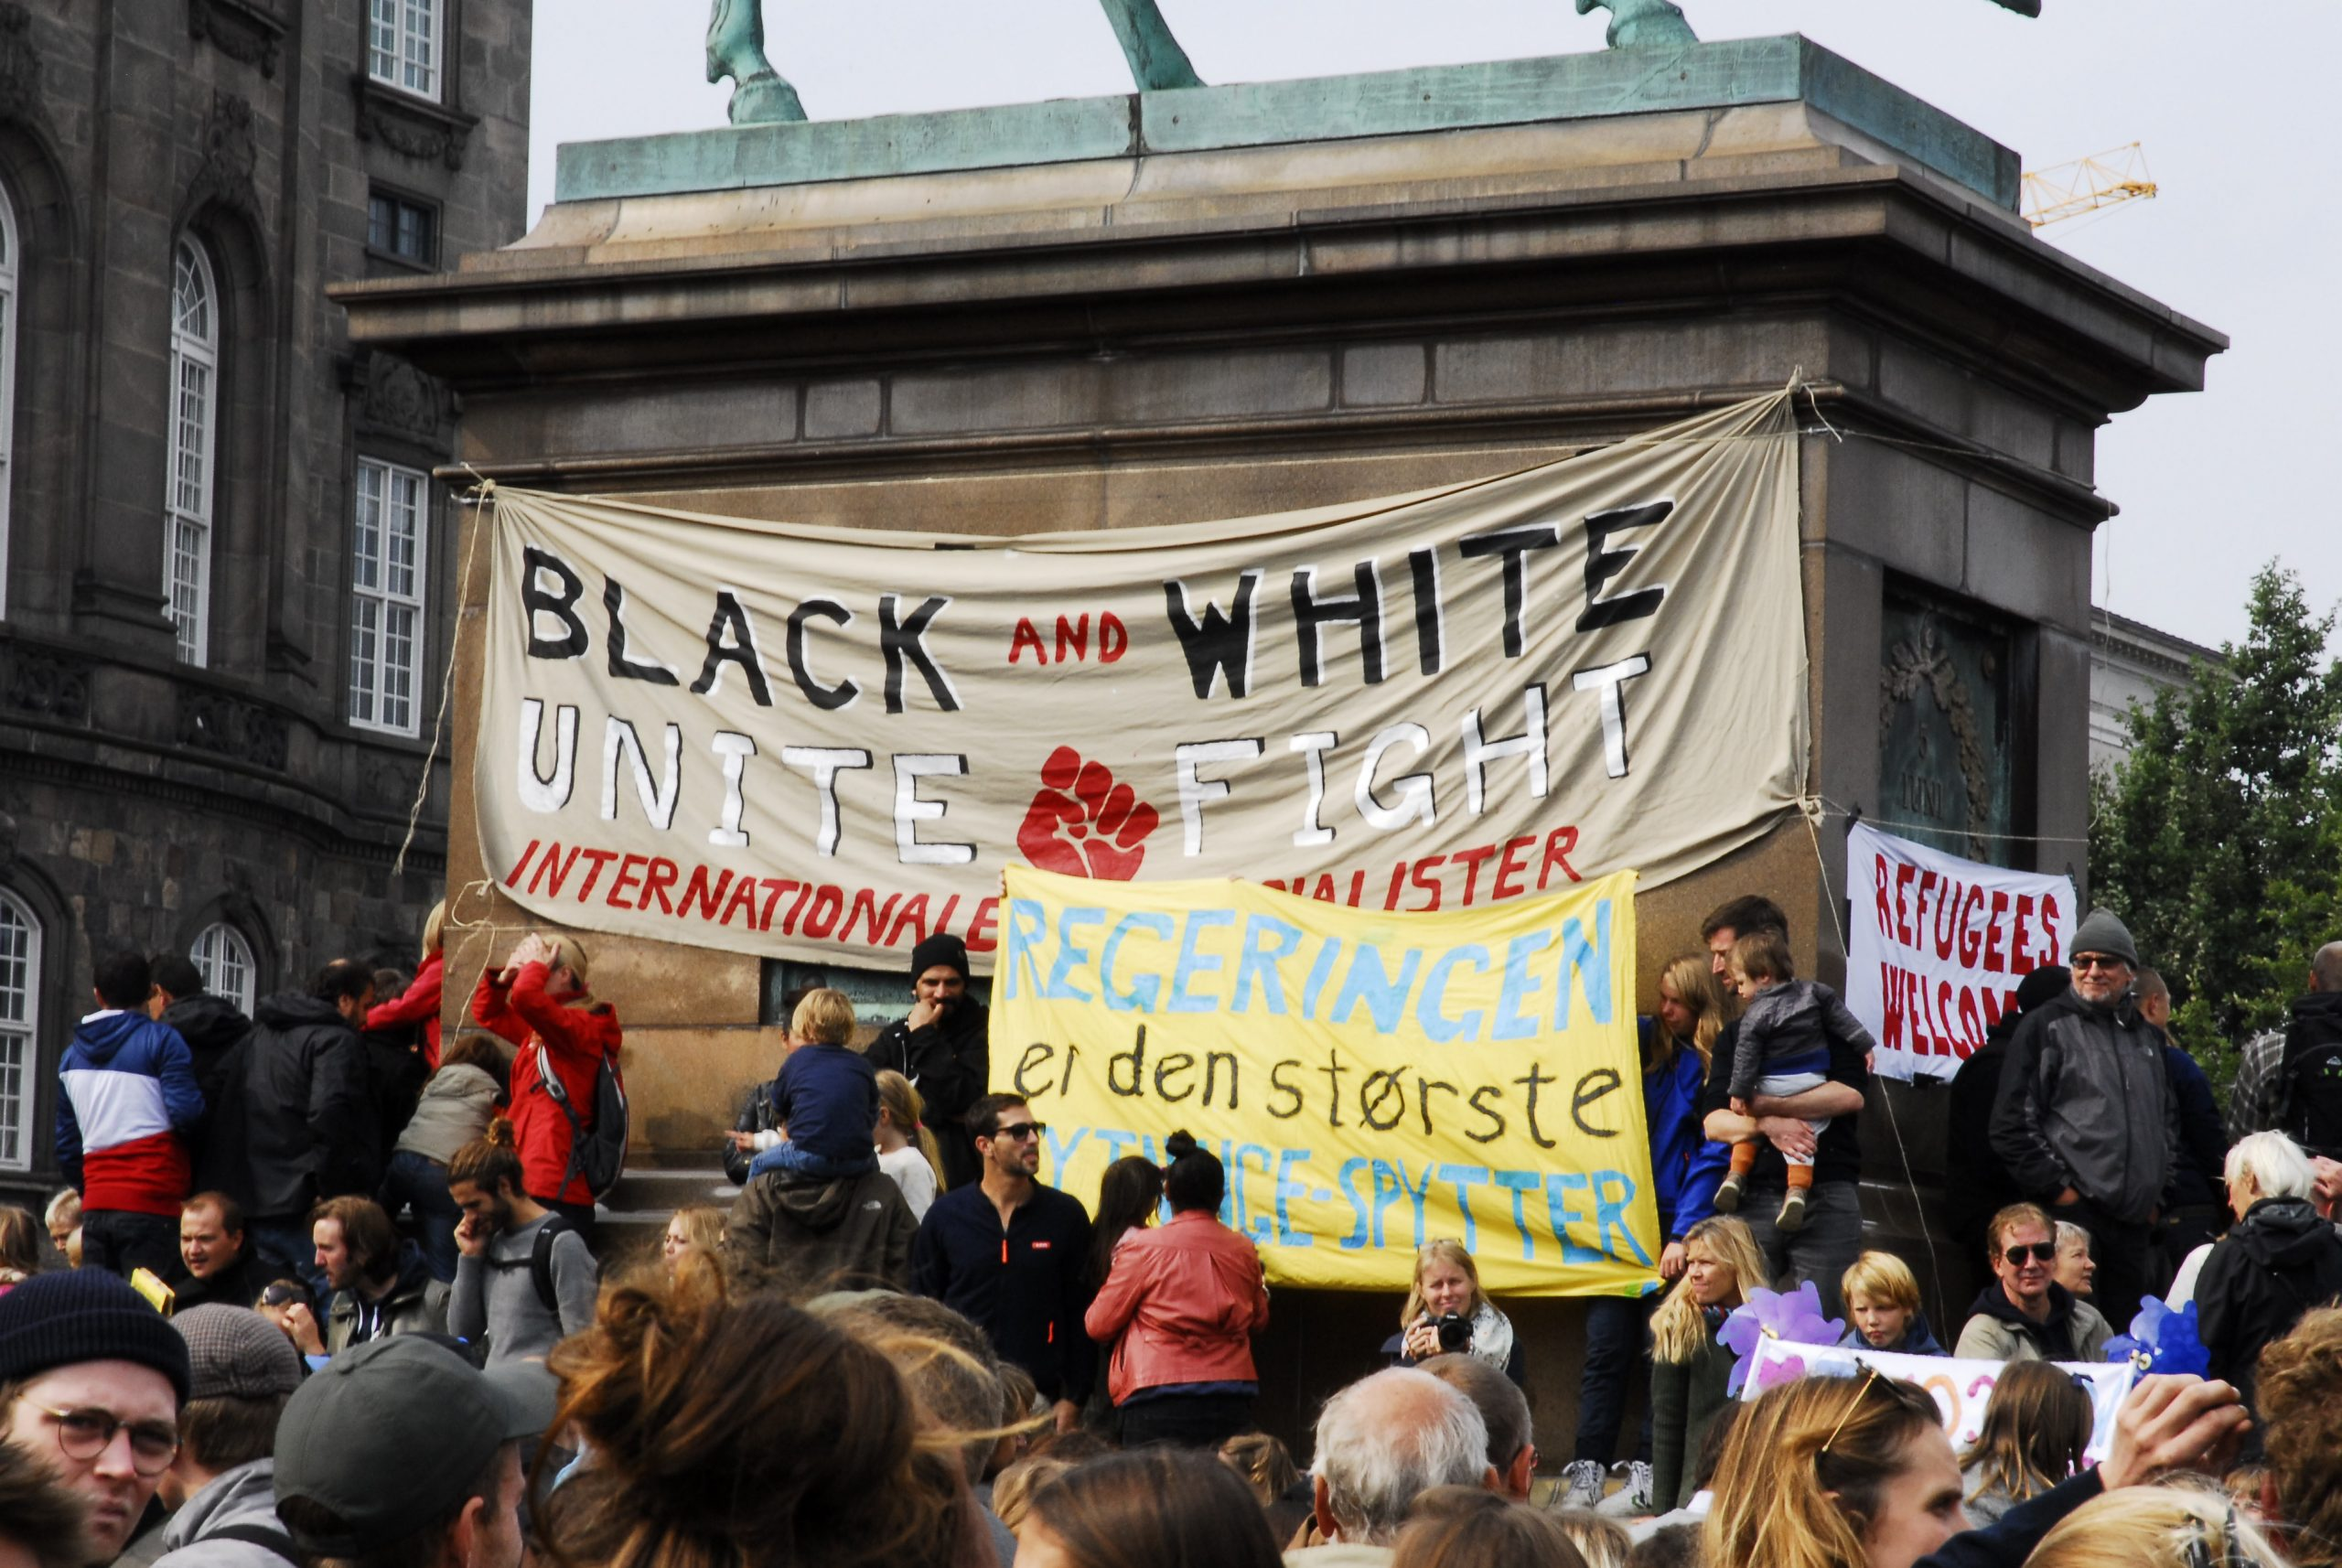 Anti-racism_demonstration,_Copenhagen,_Denmark,_2015_03